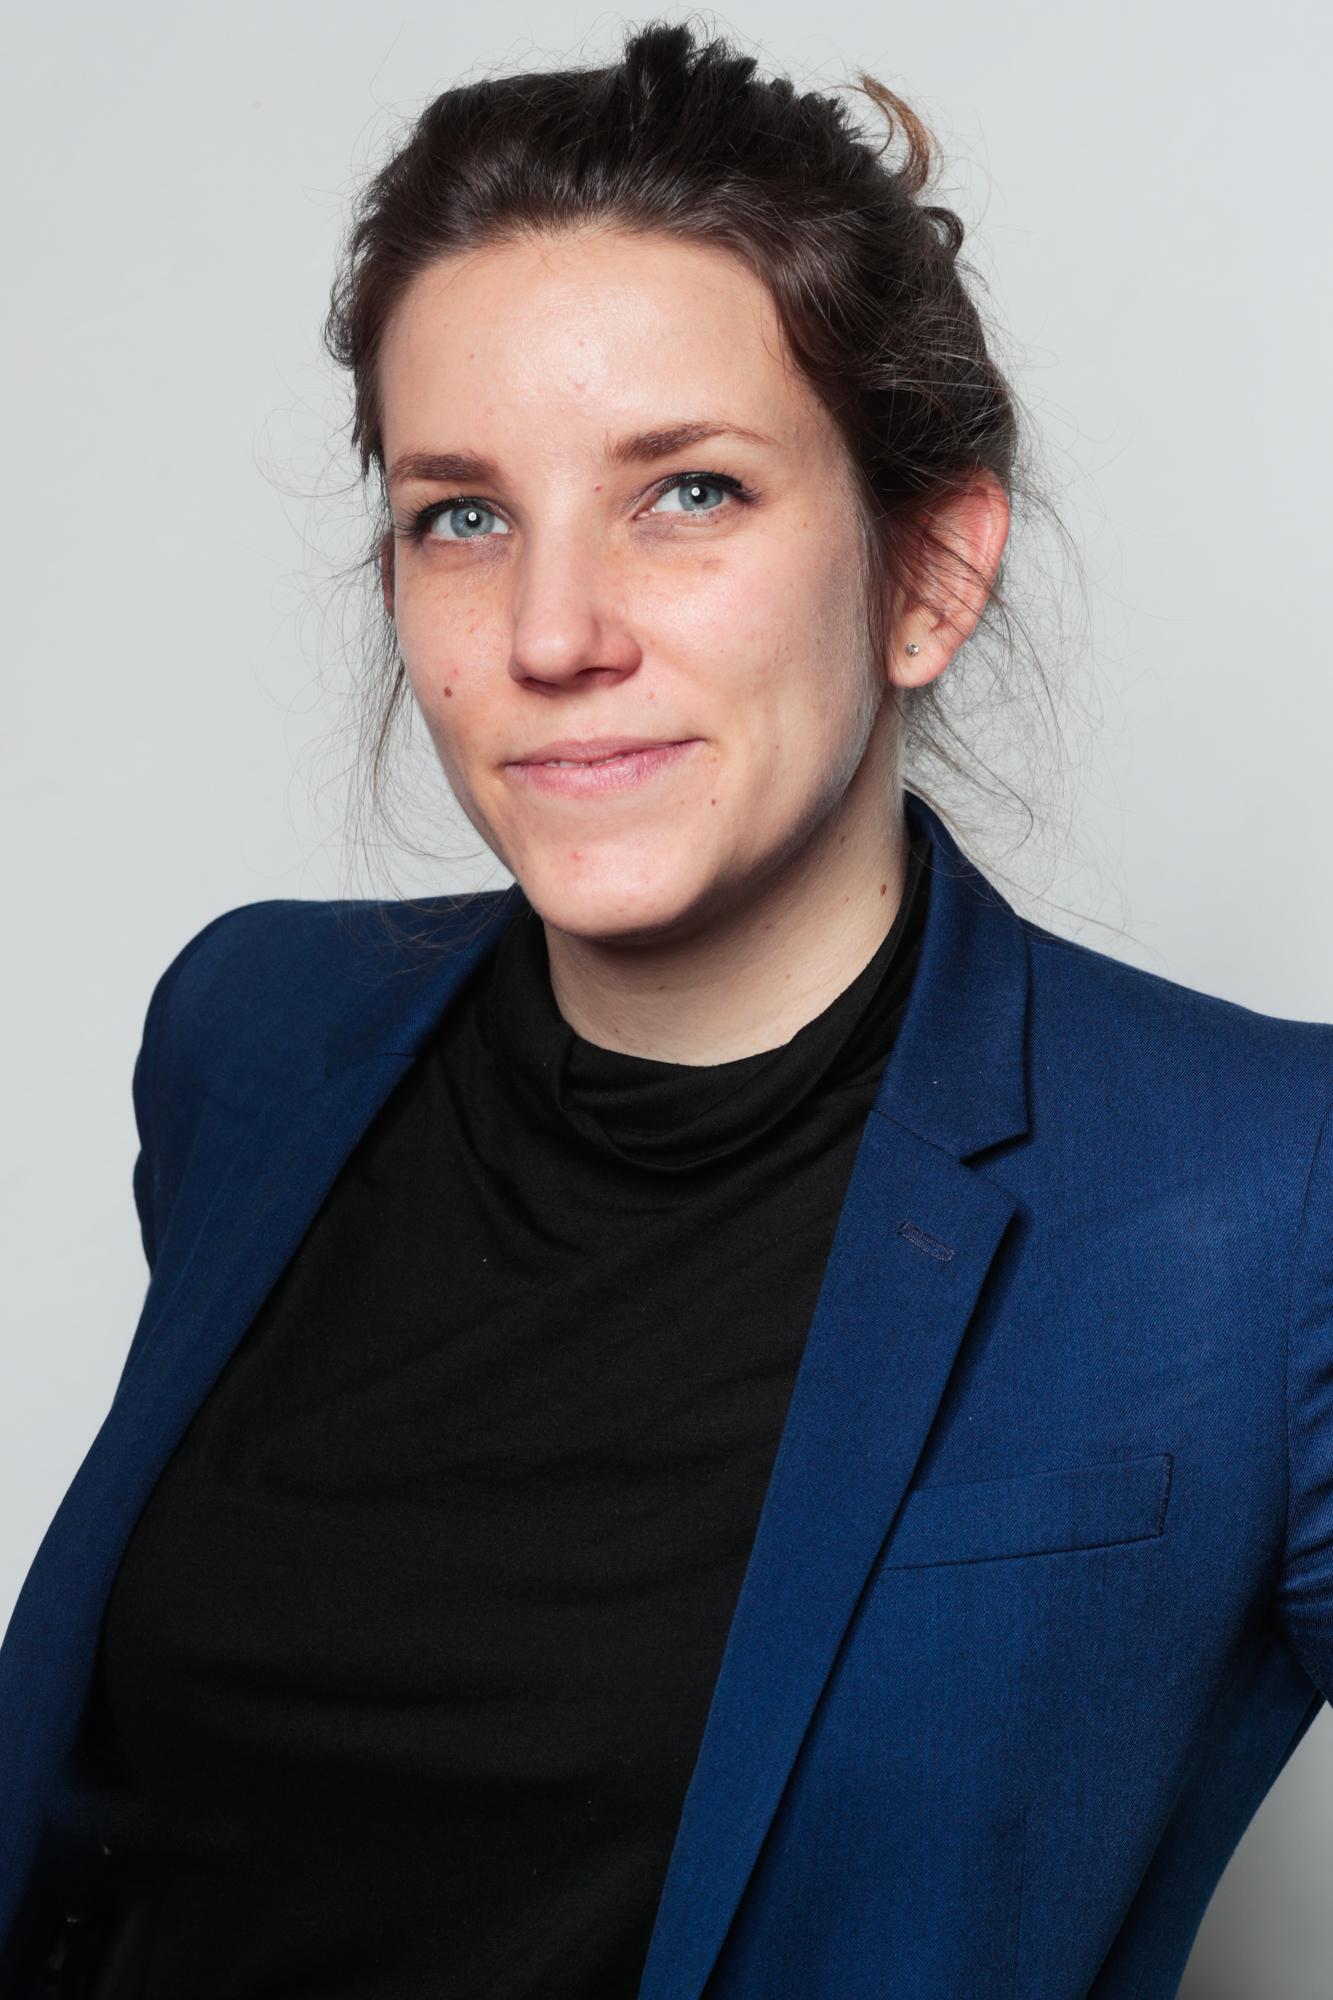 Headshot of Bernadine Bröcker Wieder